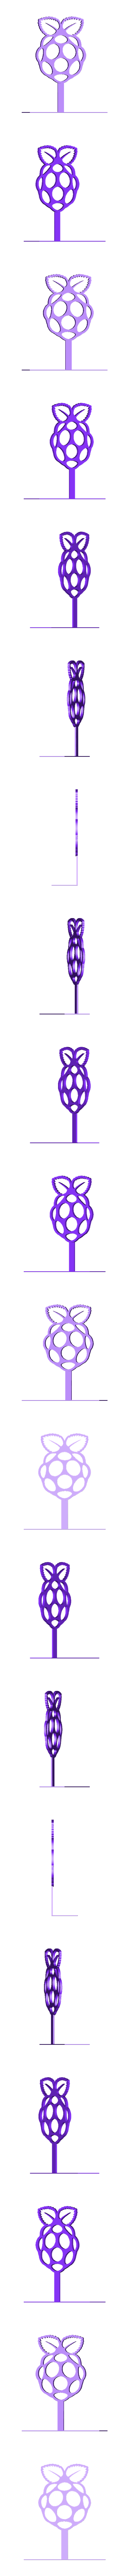 Raspberry-Pi-Logo-Stand.stl Download free STL file Raspberry Pi Logo • Model to 3D print, AwesomeA